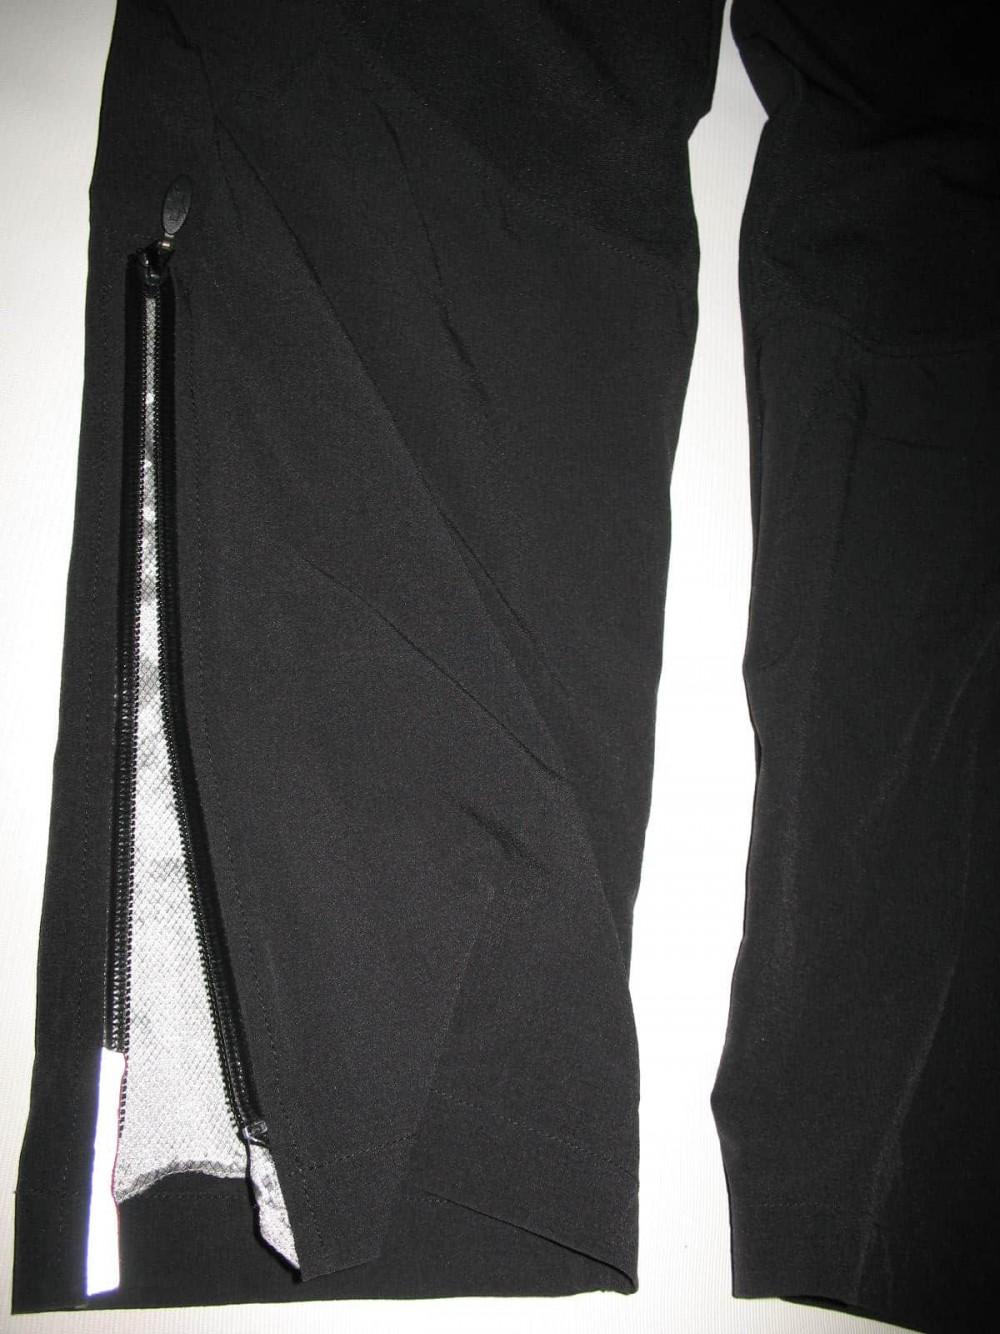 Велоштаны ASSOS db zero track cycling pants (размер XL) - 6